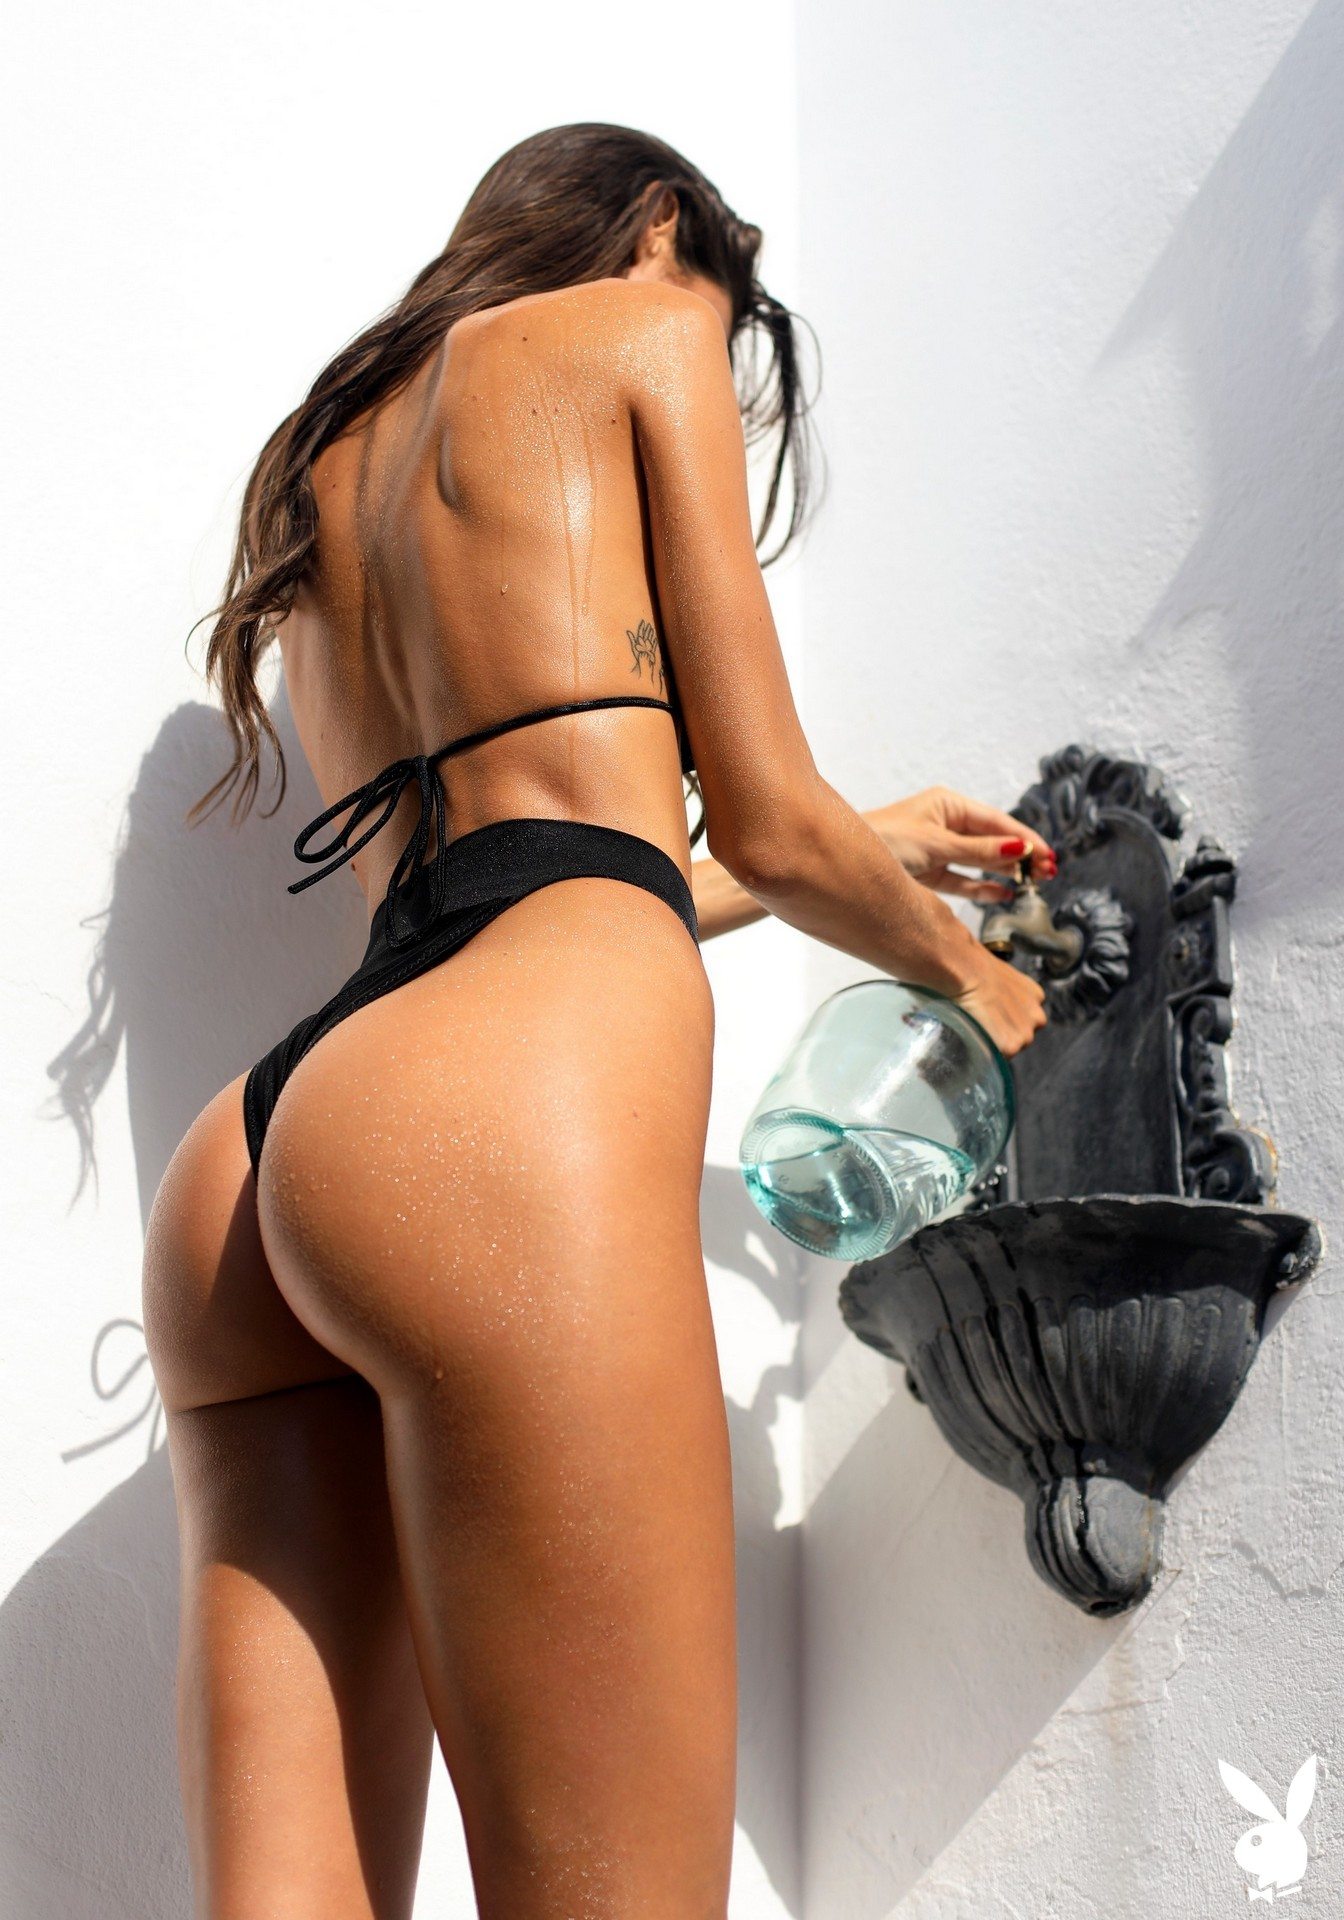 Zurine Aspiunza In Playboy International Playboy Plus (8)